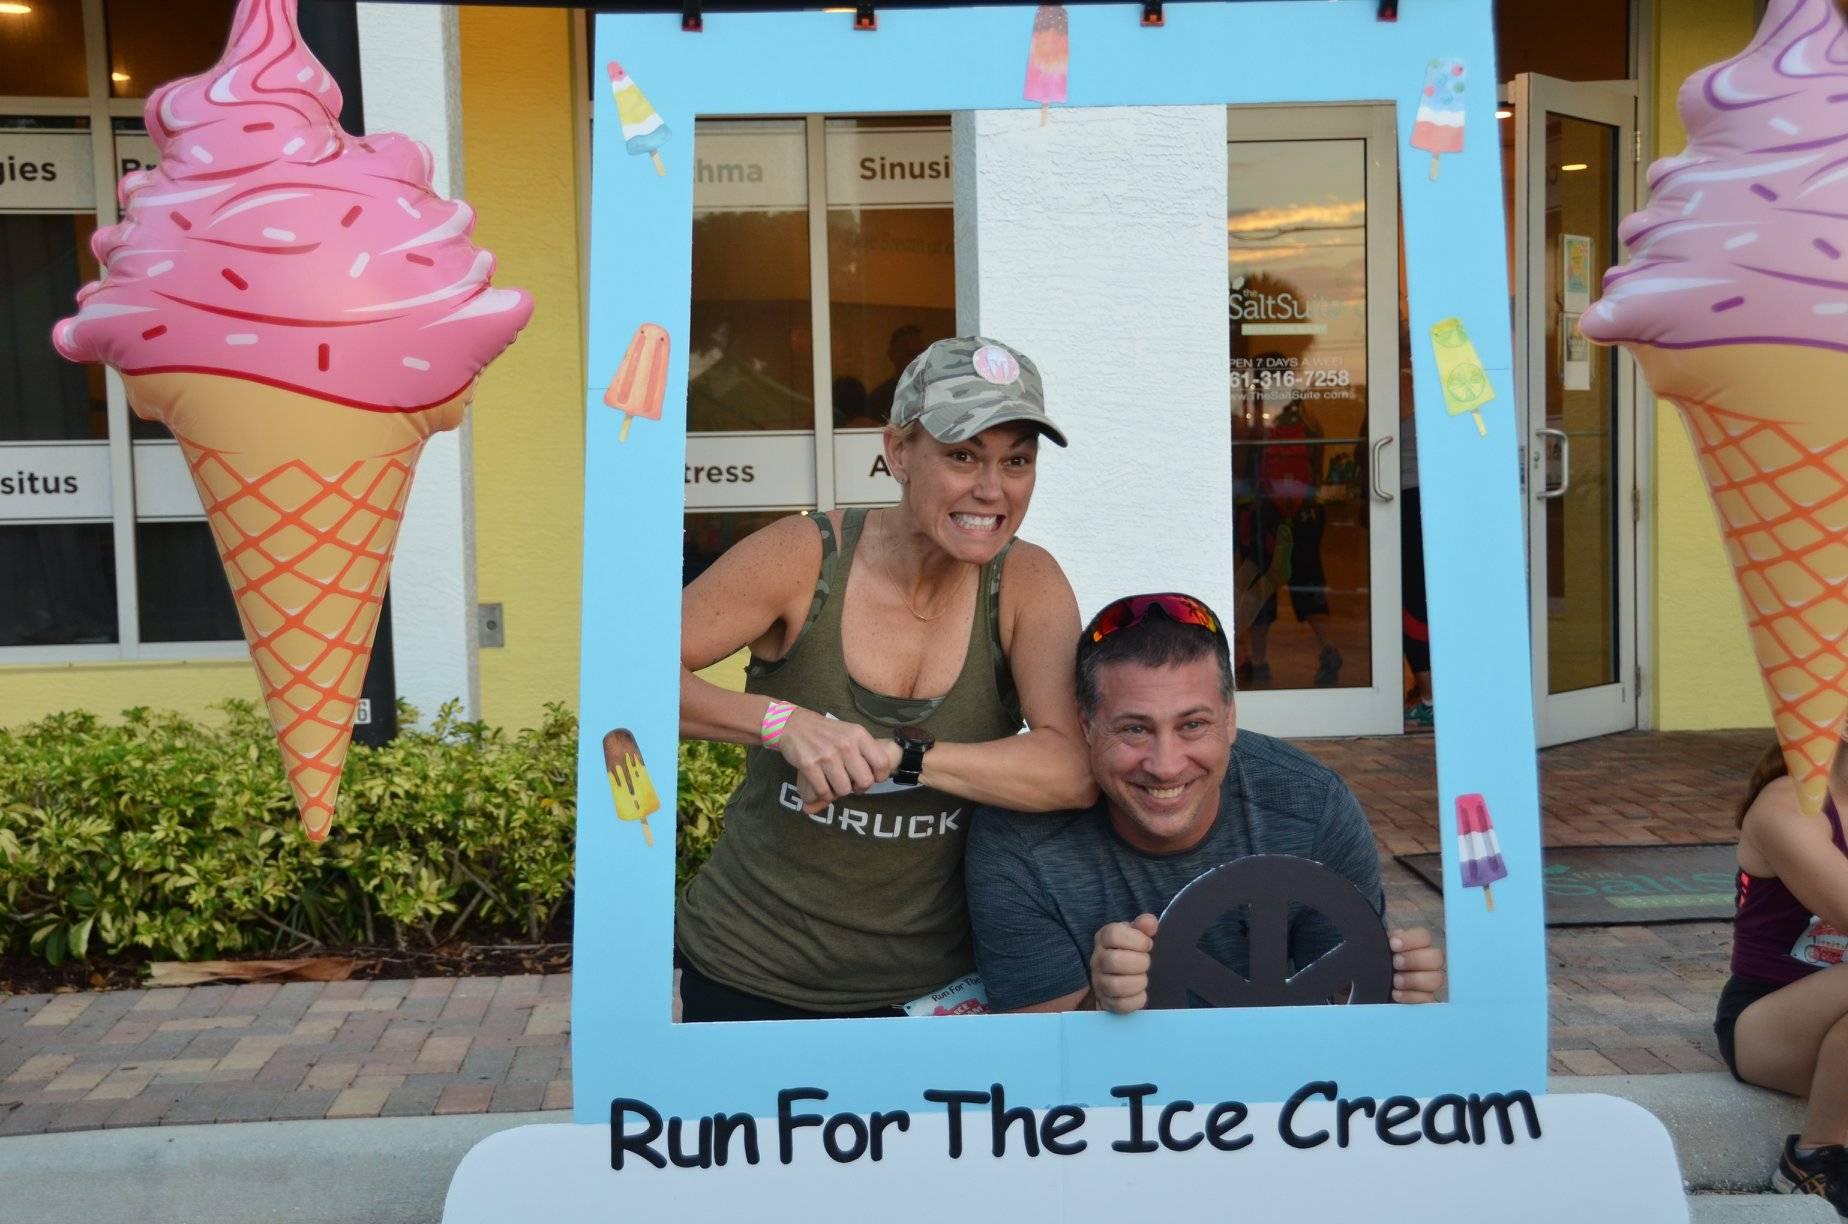 Run For The Ice Cream 5K